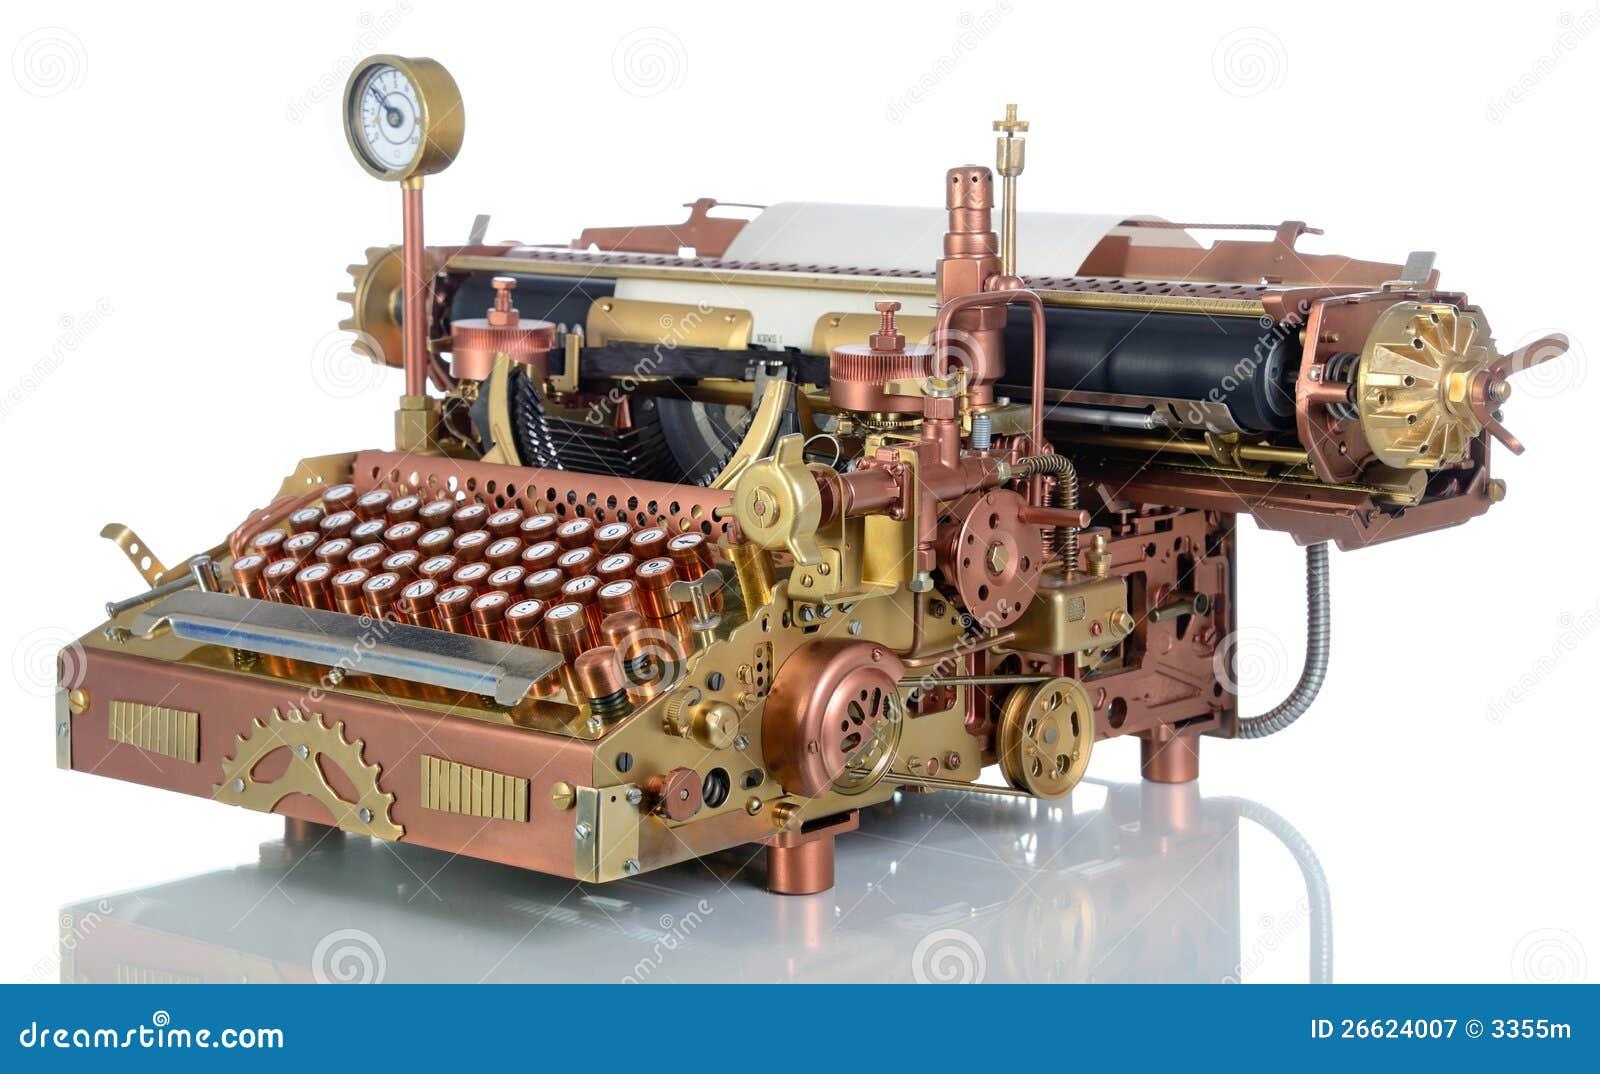 Steampunk Typewriter. Royalty Free Stock Photography - Image: 26624007